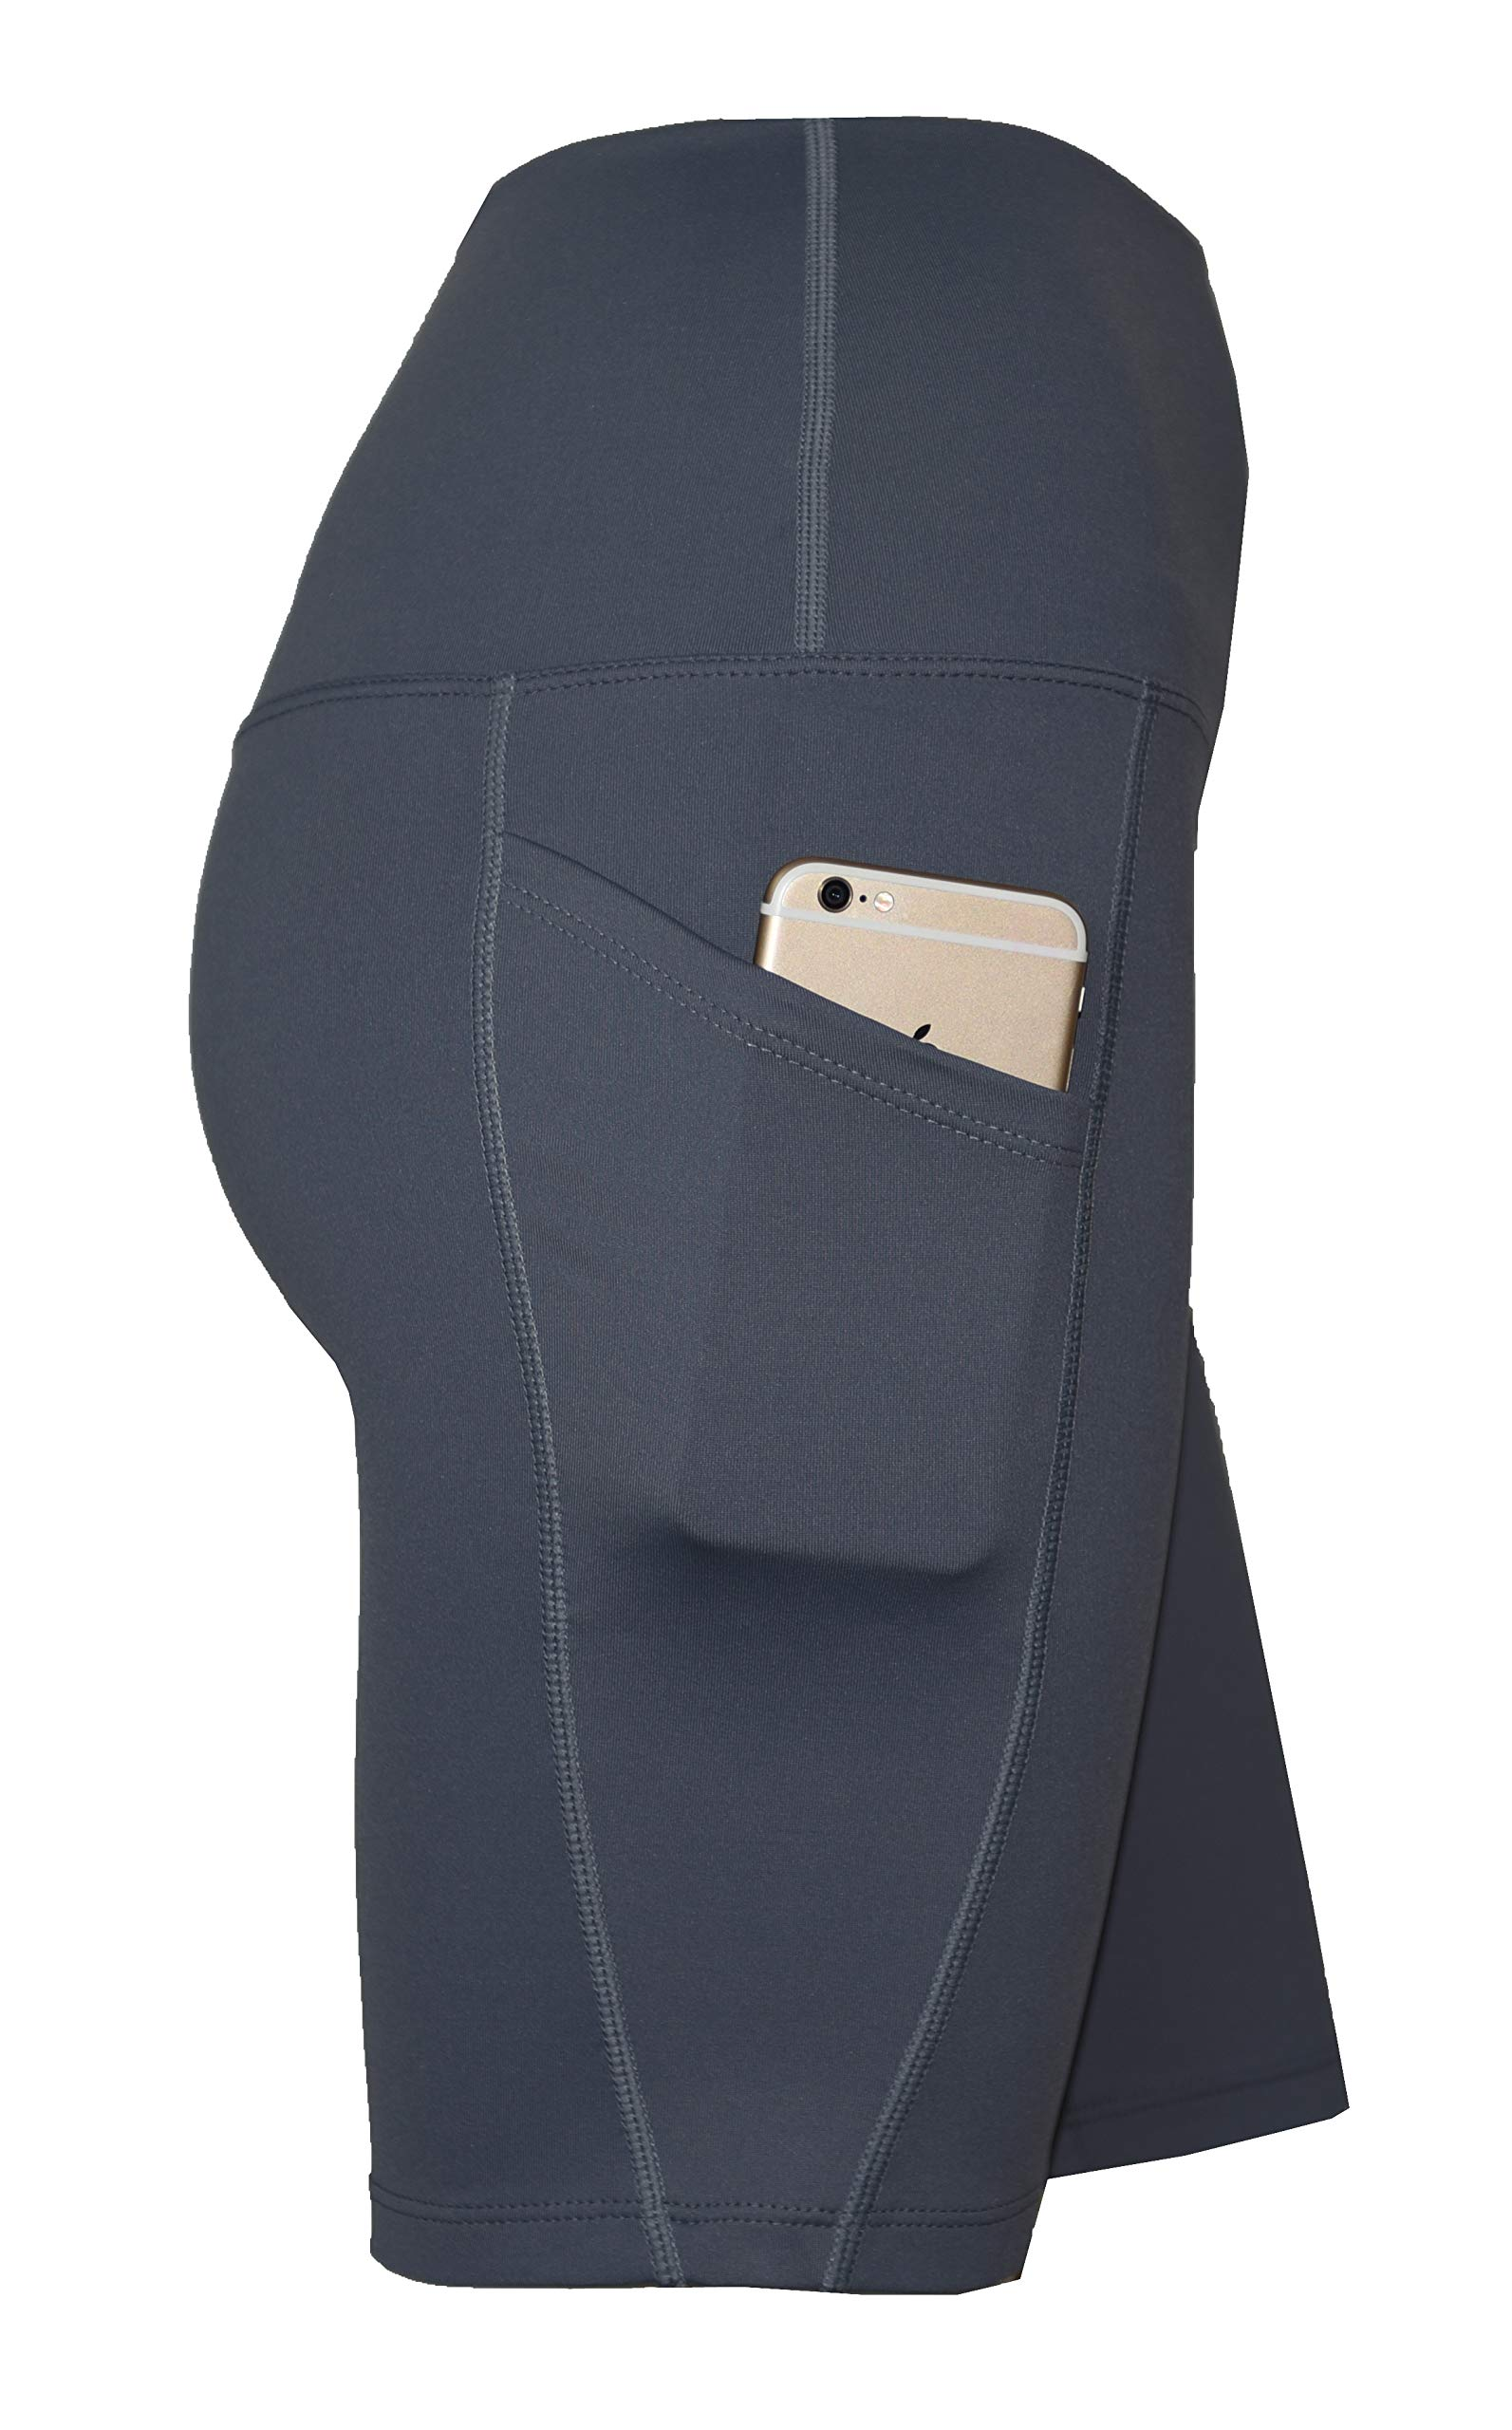 Private Island Women UV Swim Rash Guard Board Shorts Pants Yoga (XXXL, Grey) by Private Island